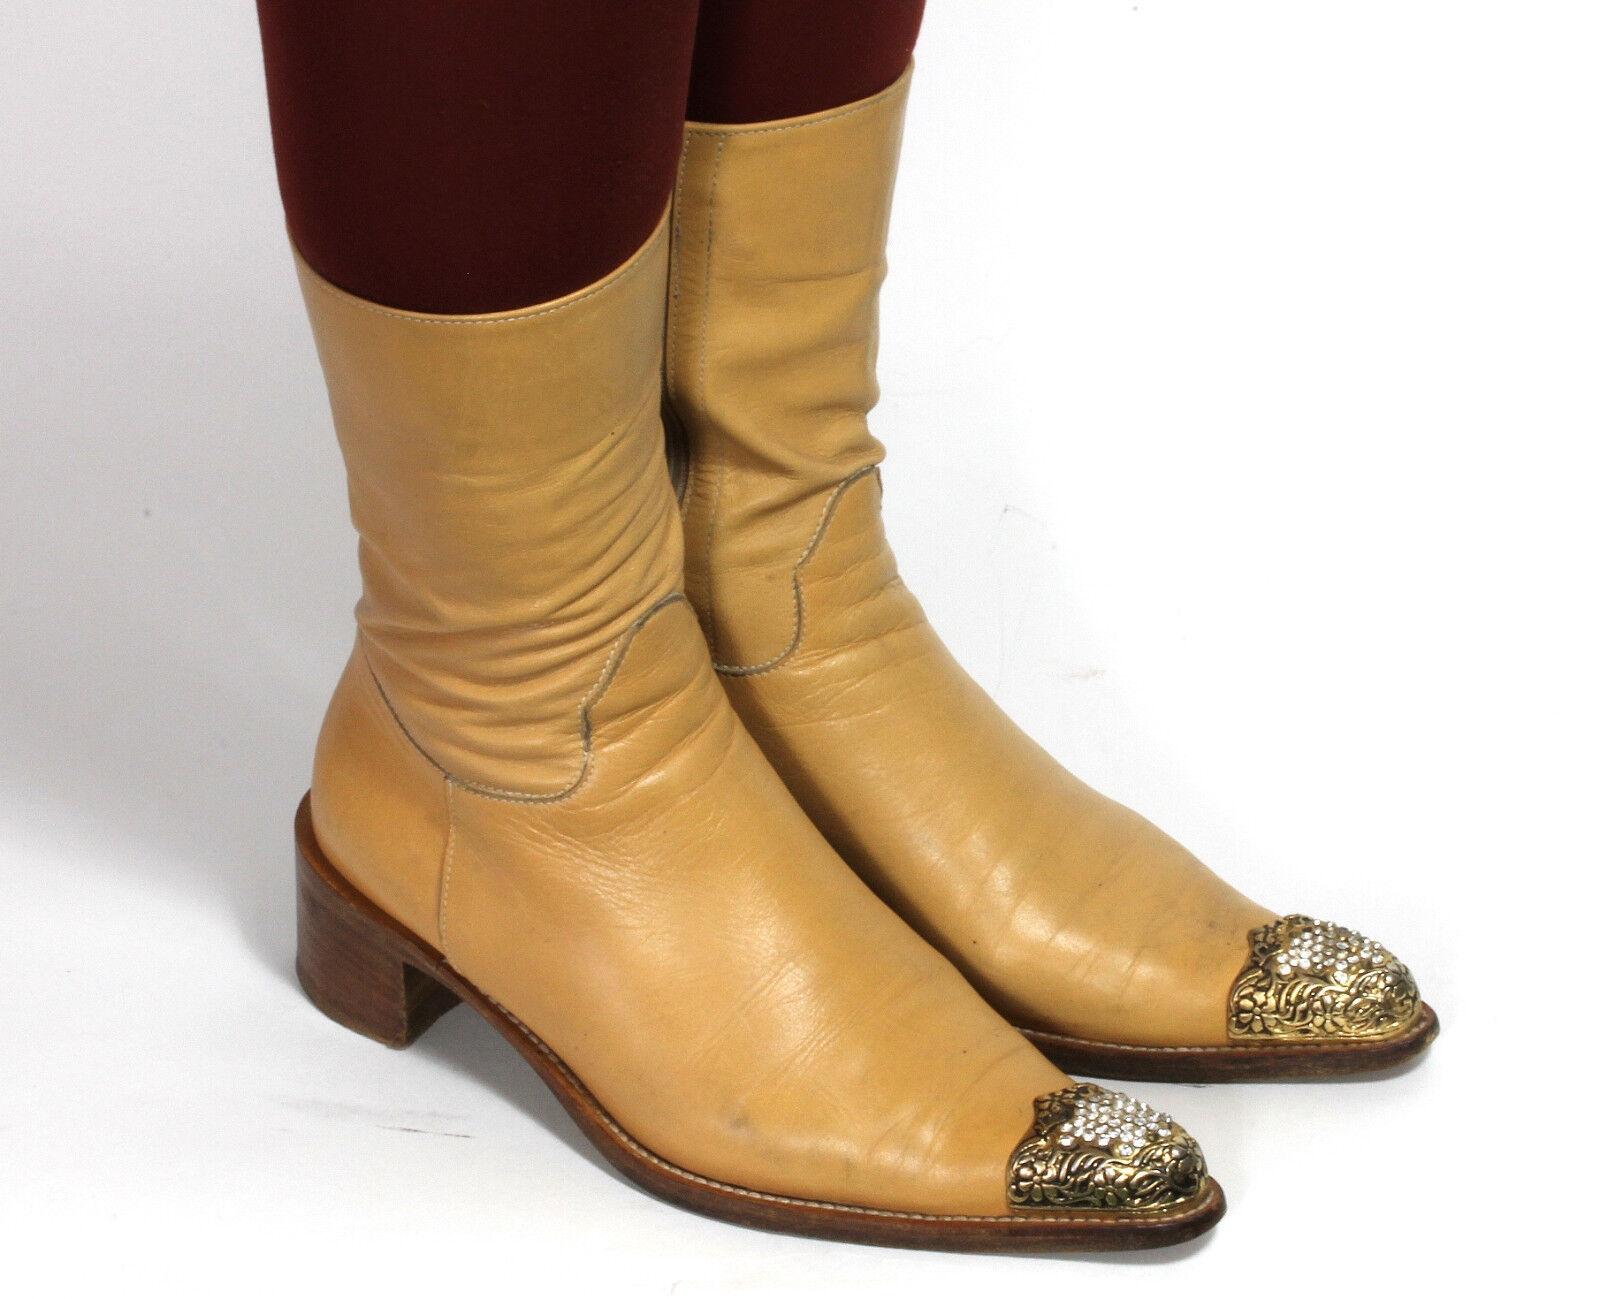 Stivali Western Cowboy Stivali Catalan Style MASSIMO LONARDO Stivali da Donna 37